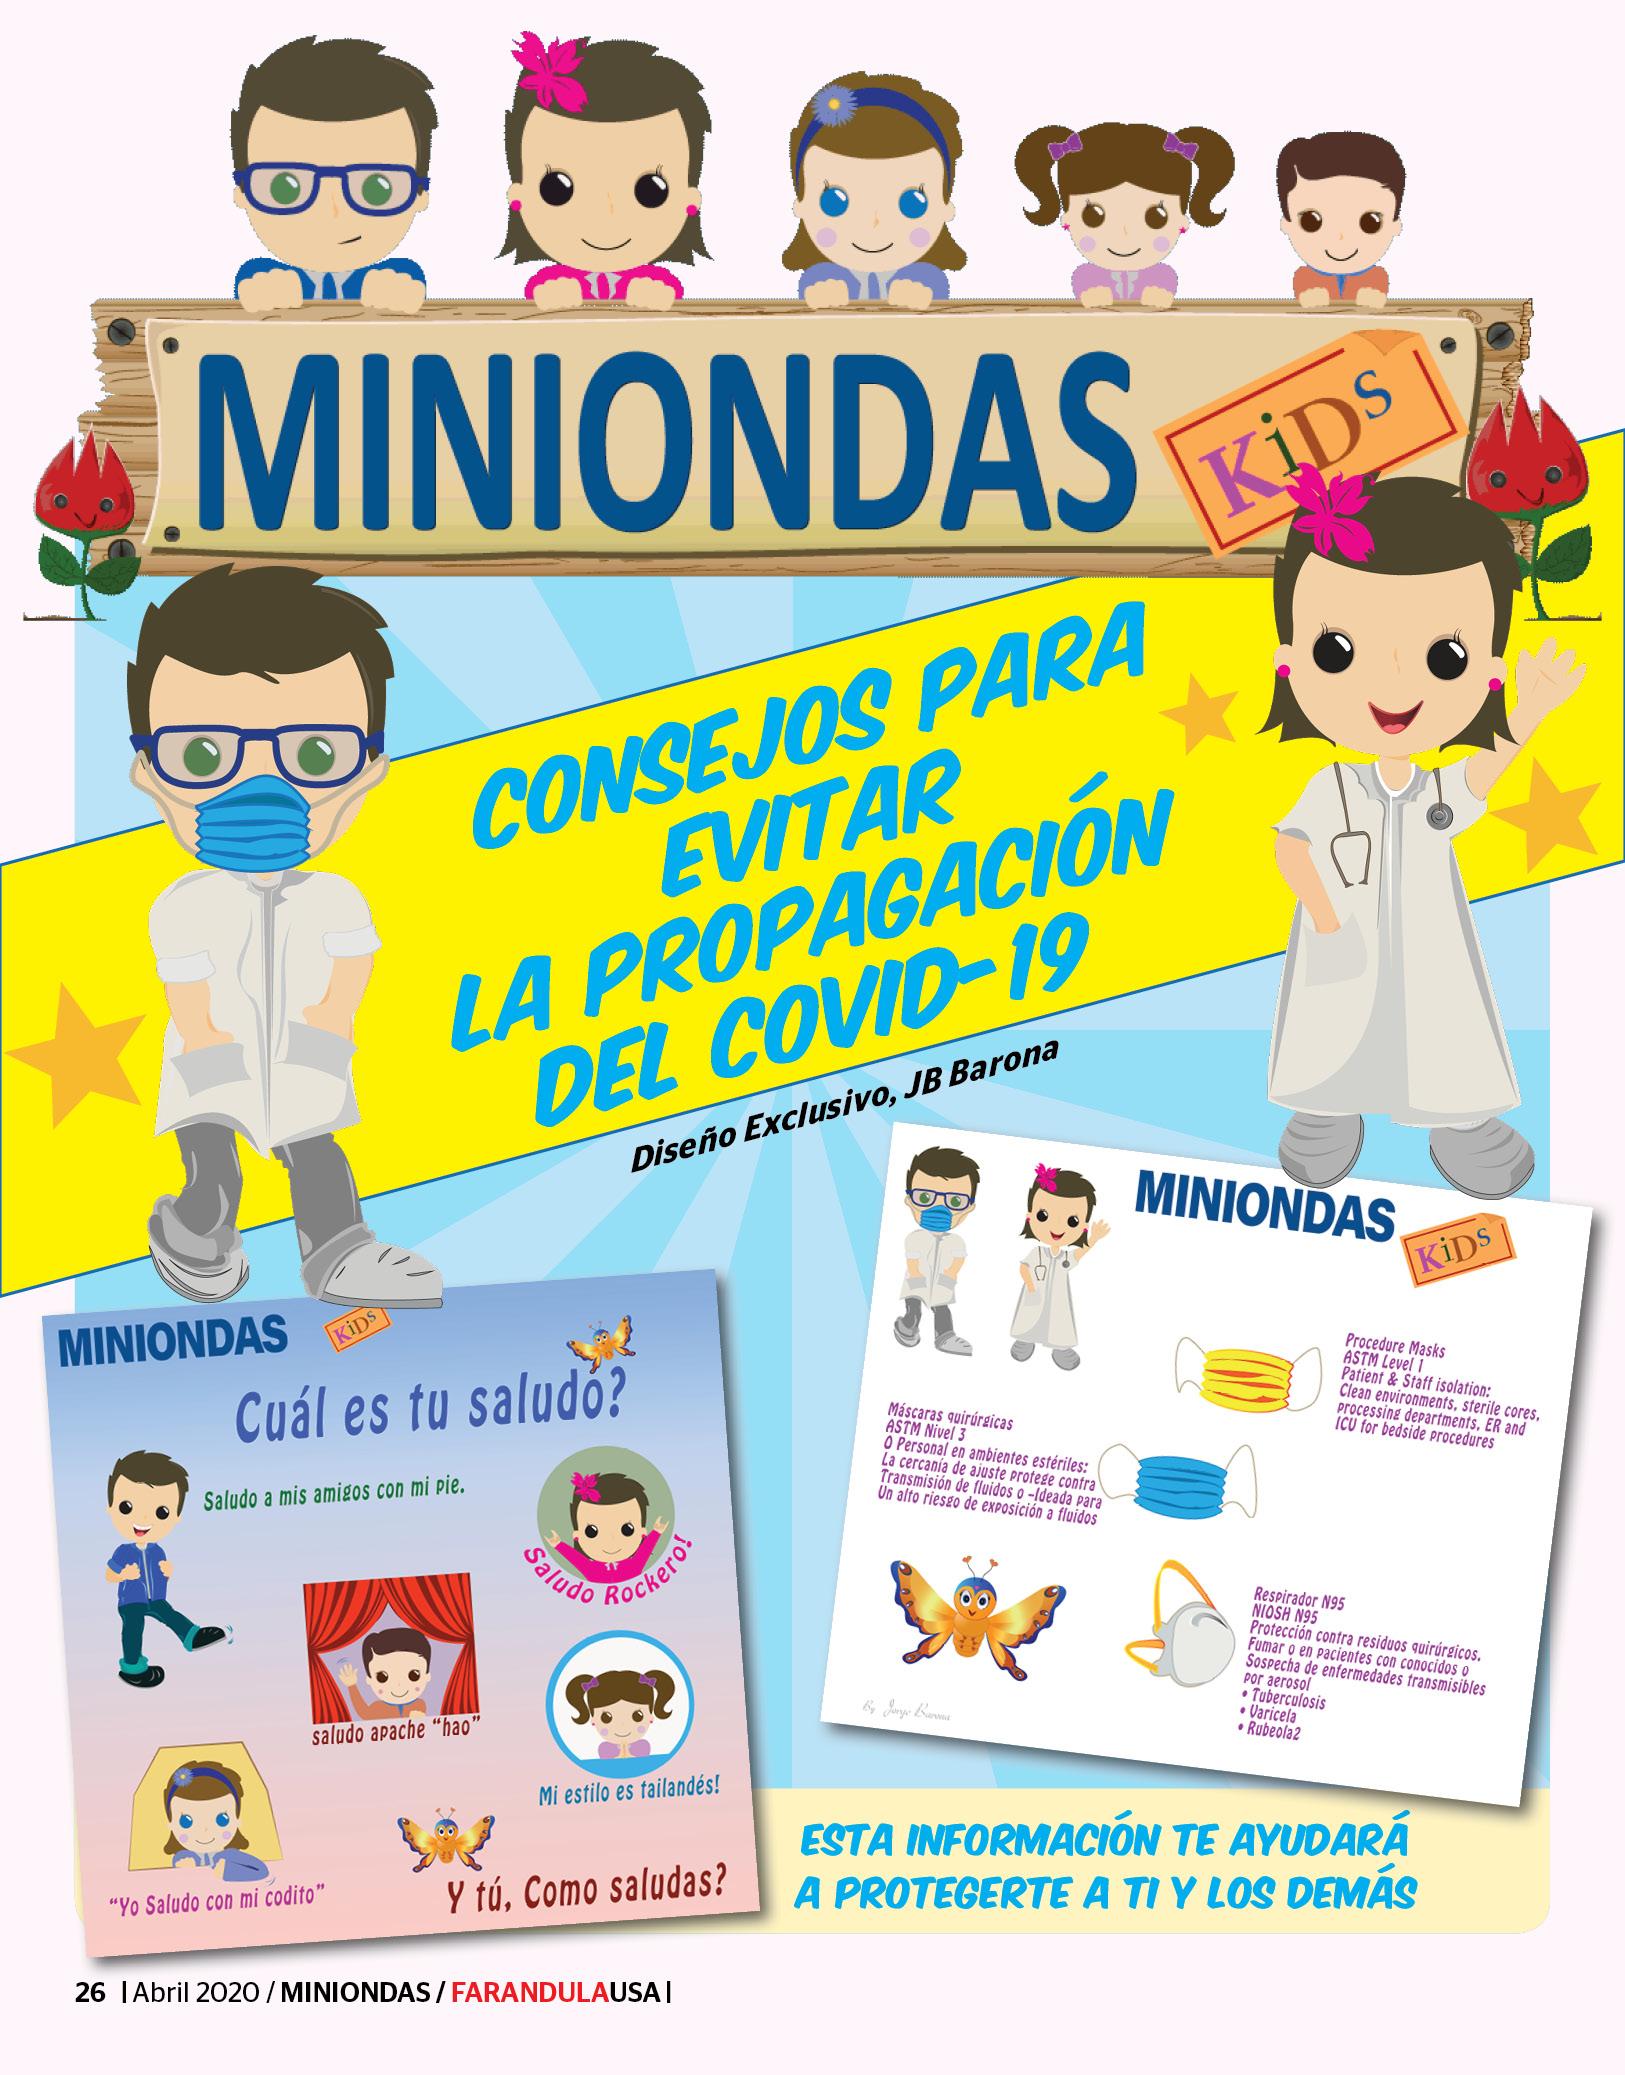 Miniondas Kids - Coronavirus